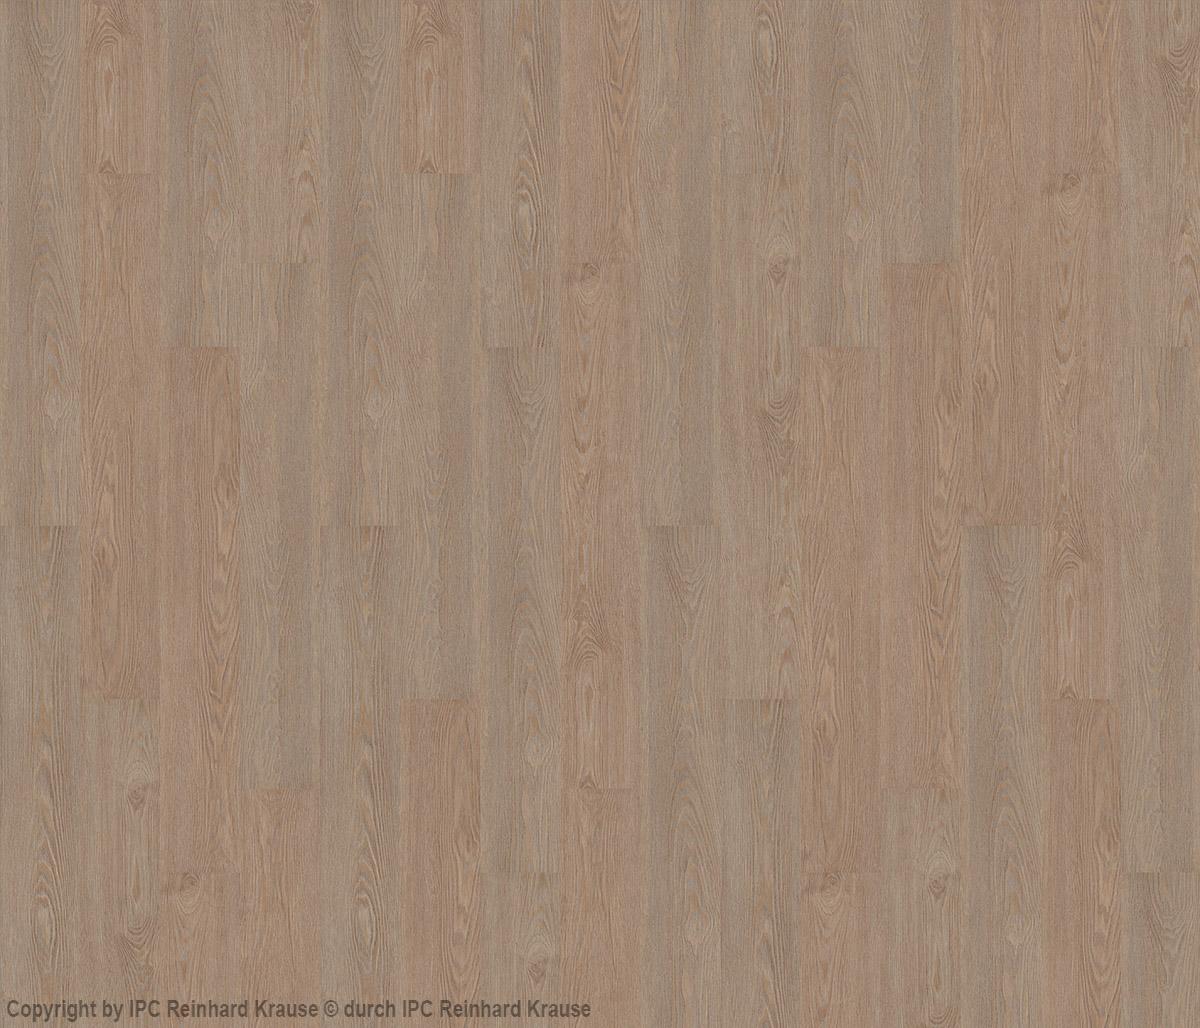 vinyl designboden elegance holly eiche d ne strukturpr gung holzboden. Black Bedroom Furniture Sets. Home Design Ideas